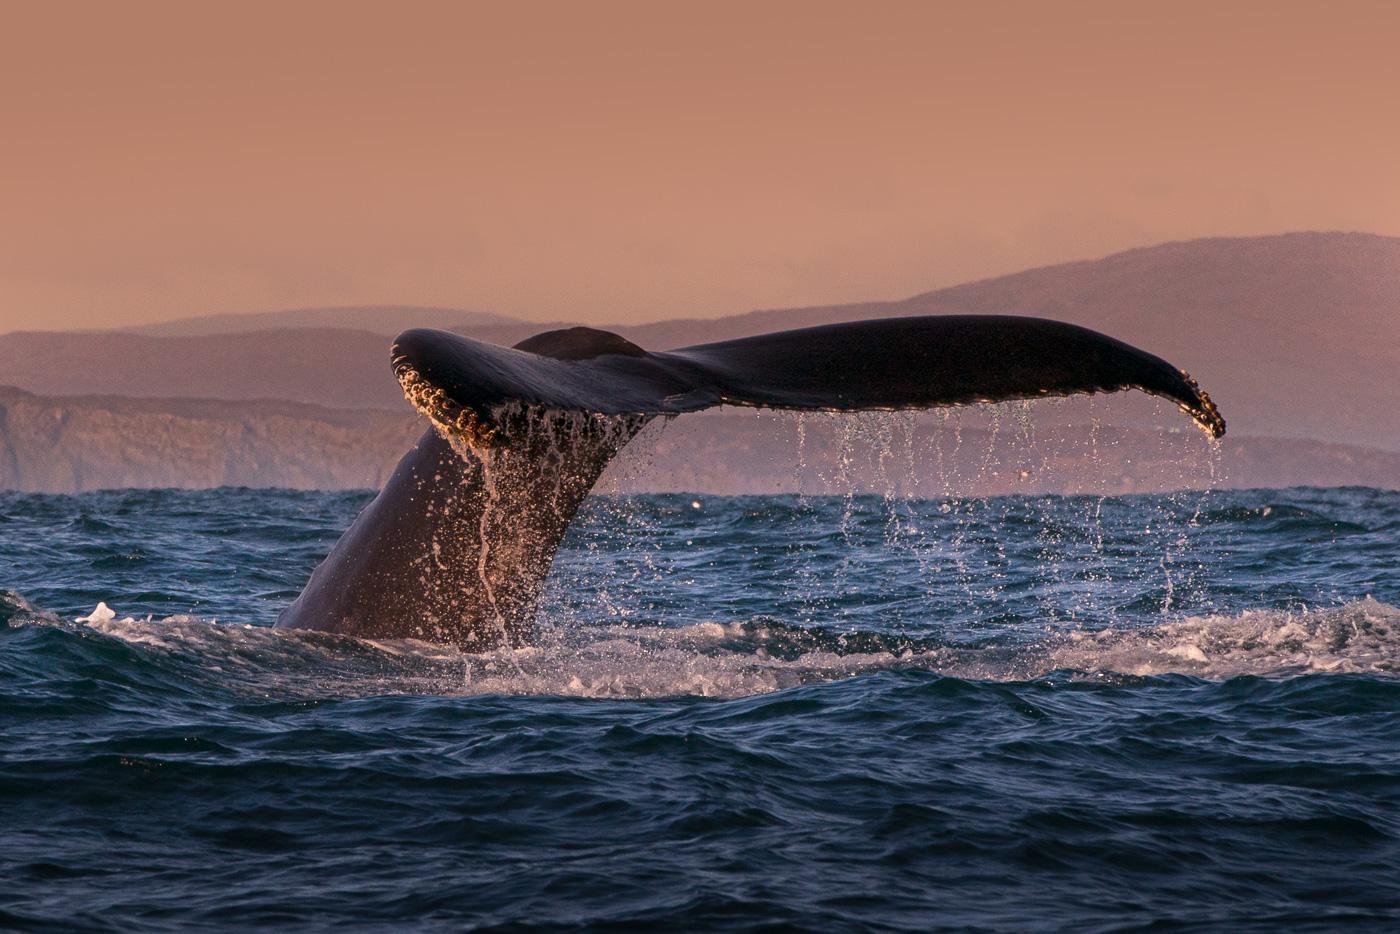 humpack_whale_cork_tail_ireland